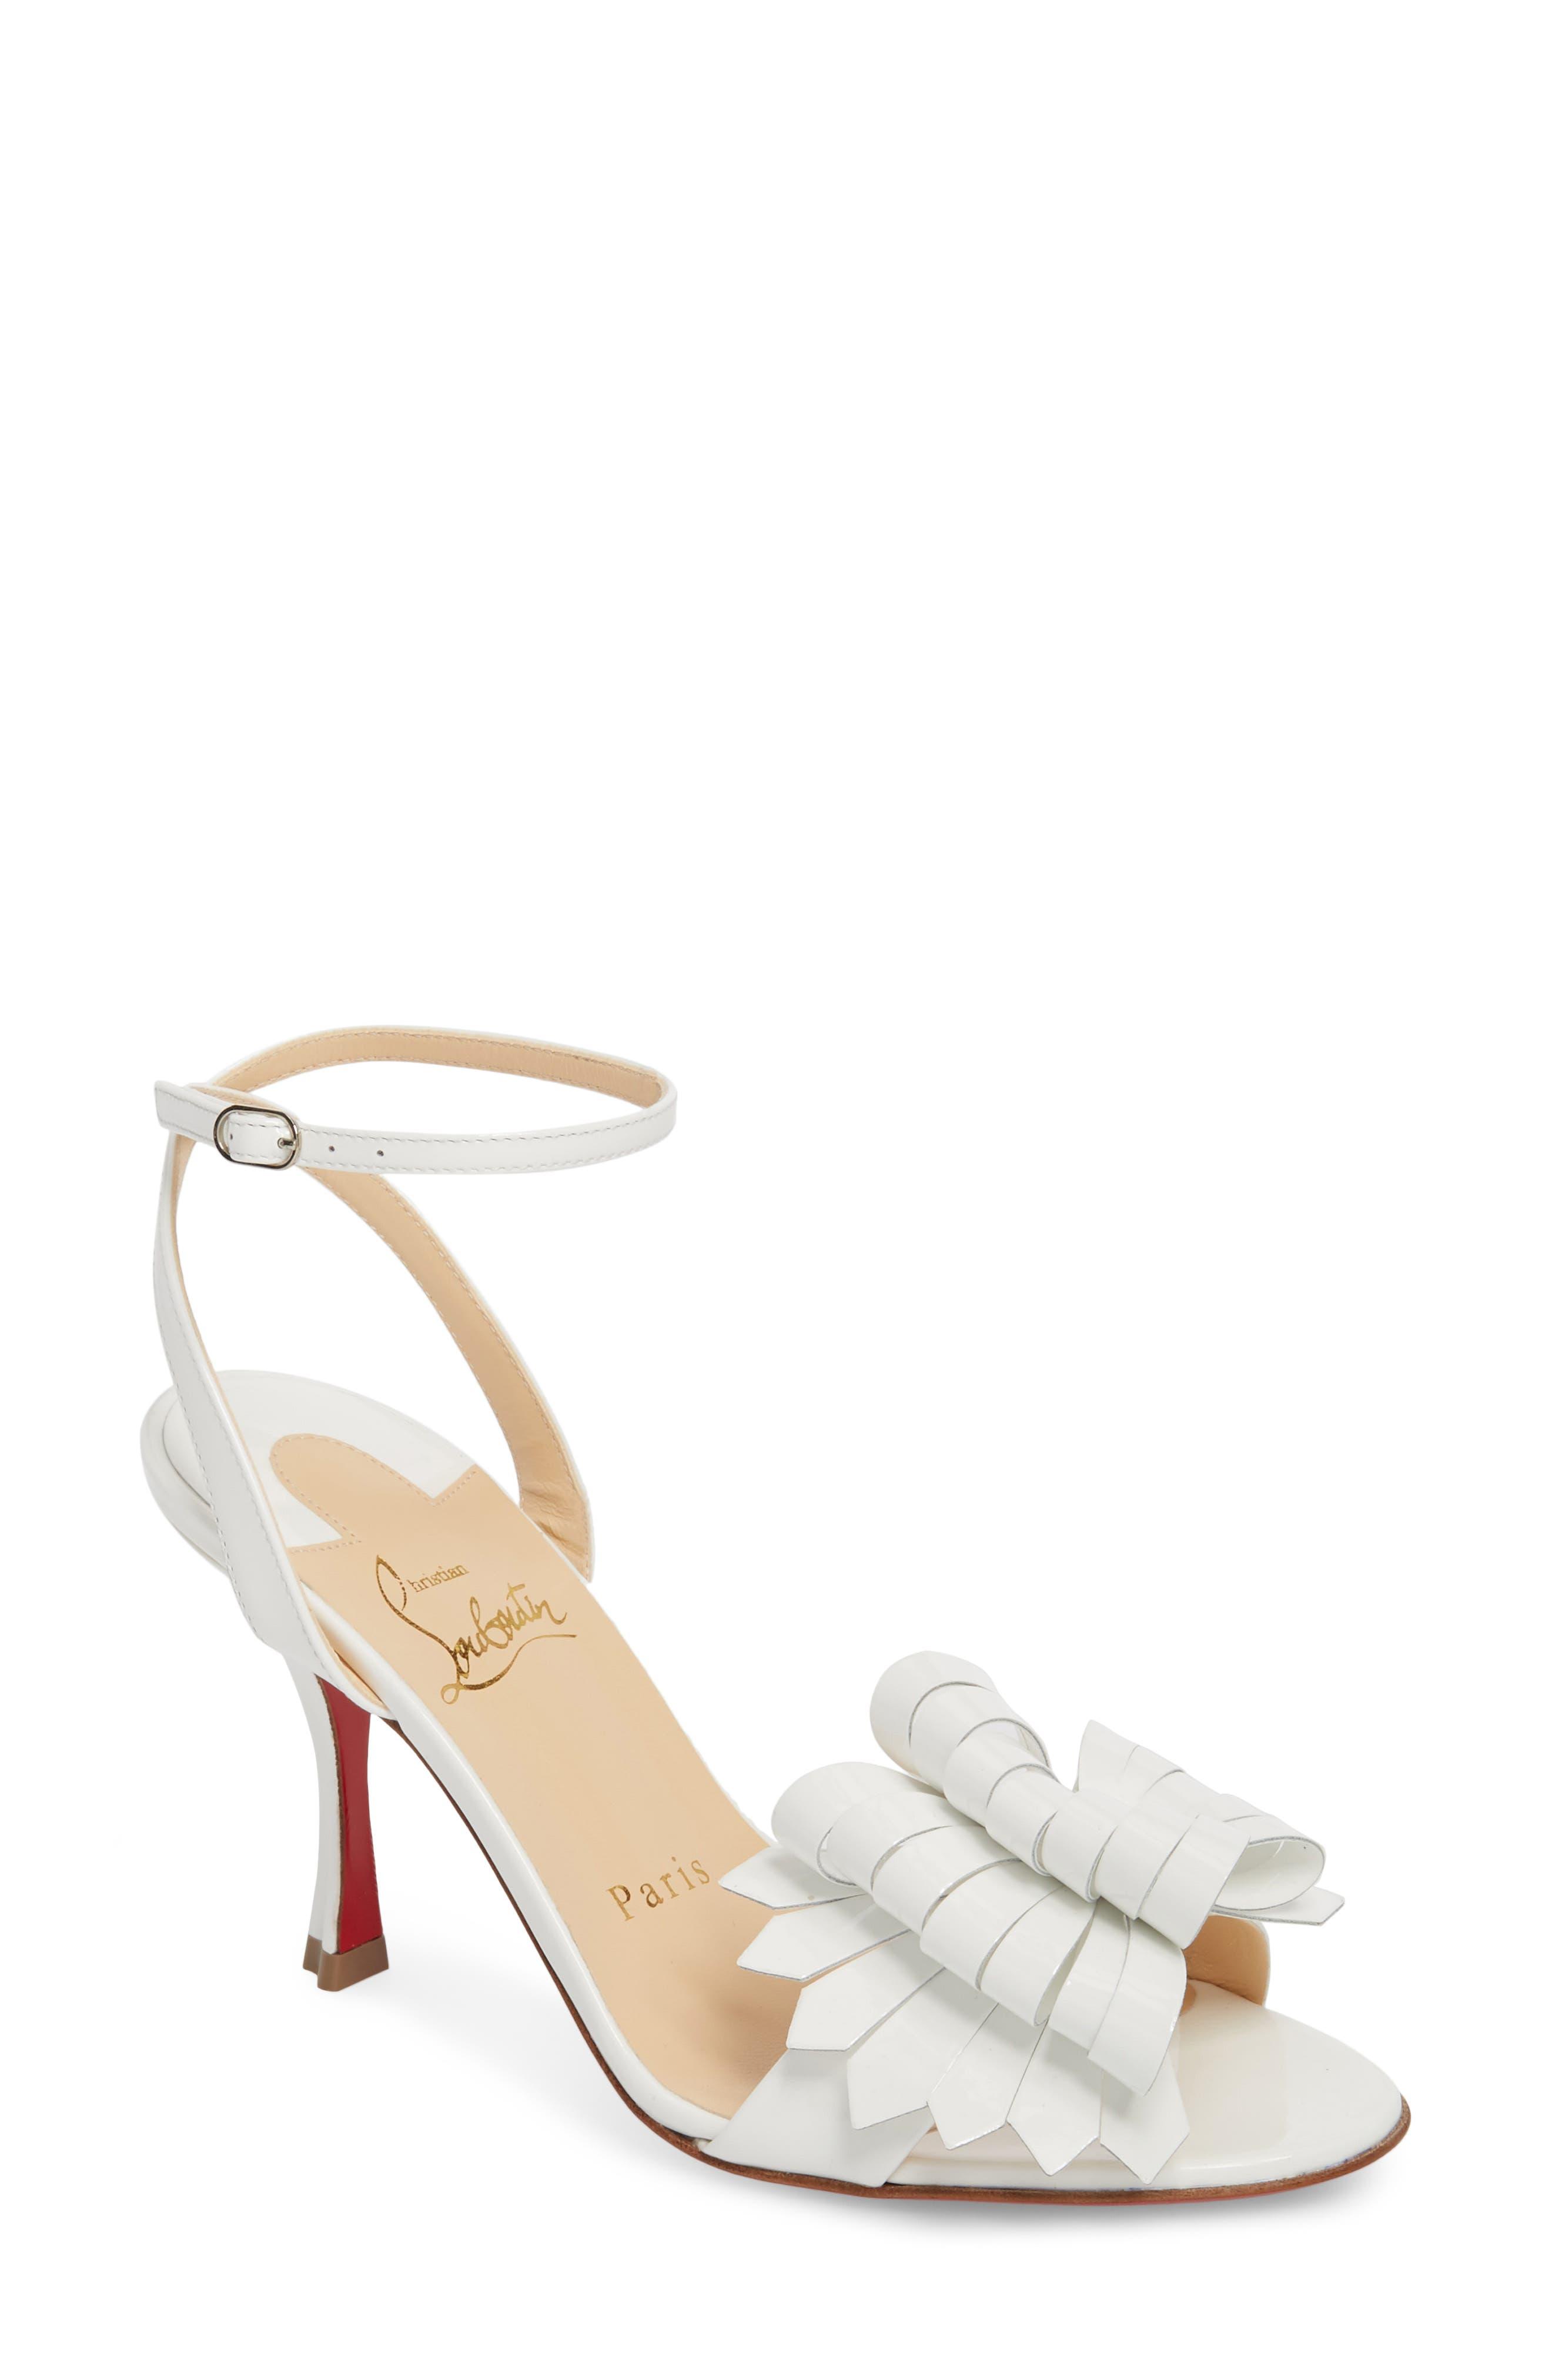 Miss Valois Bow Ankle Strap Sandal,                             Main thumbnail 2, color,